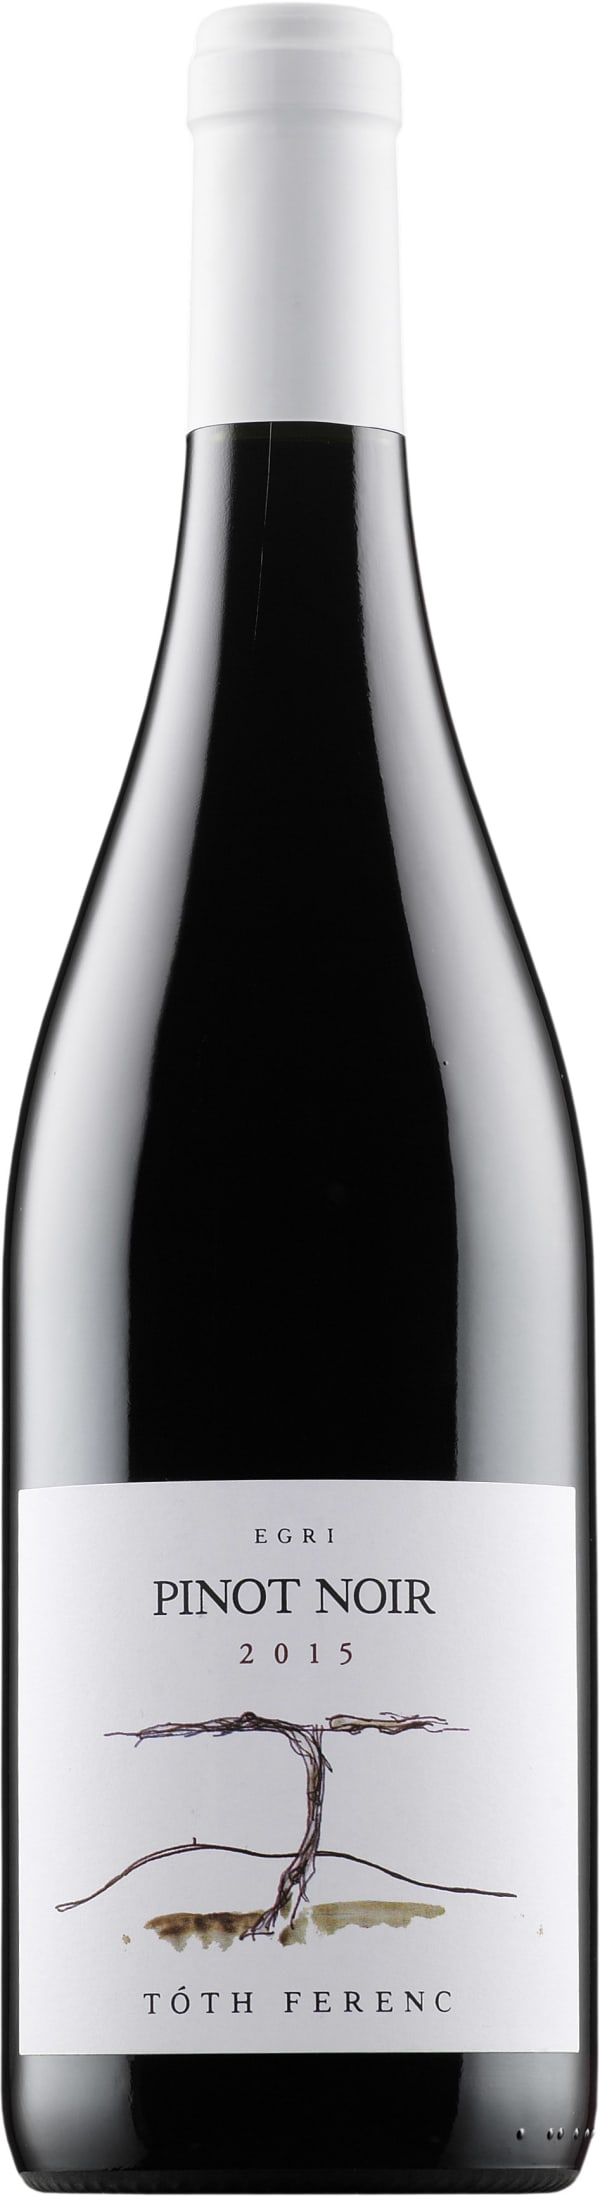 Tóth Ferenc Egri Pinot Noir 2015